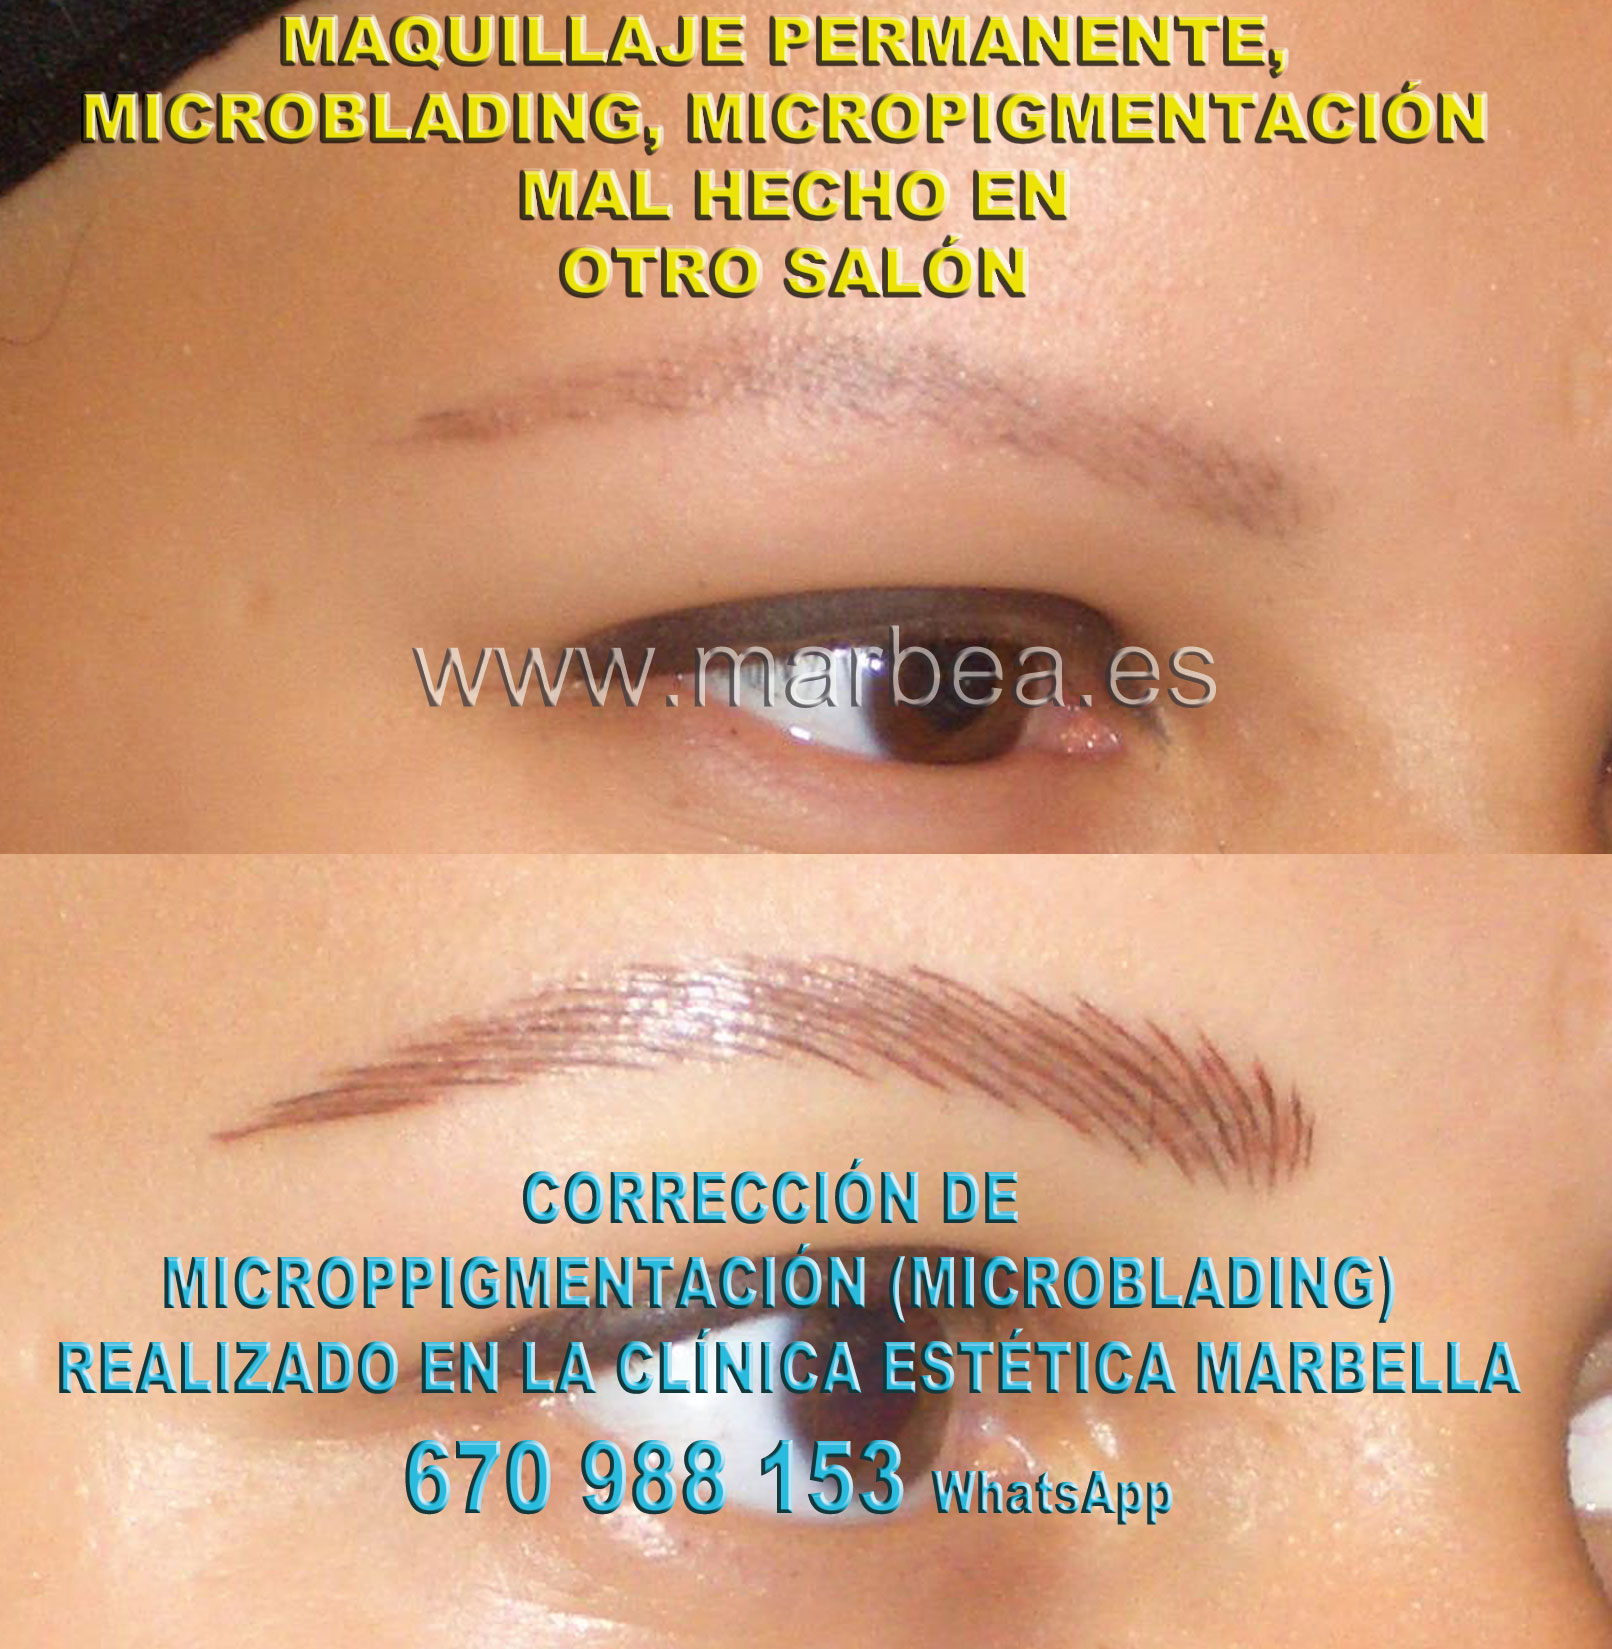 ELIMINAR TATUAJE CEJAS clínica estética delineados propone micropigmentacion correctiva de cejas,corregir micropigmentación no deseada